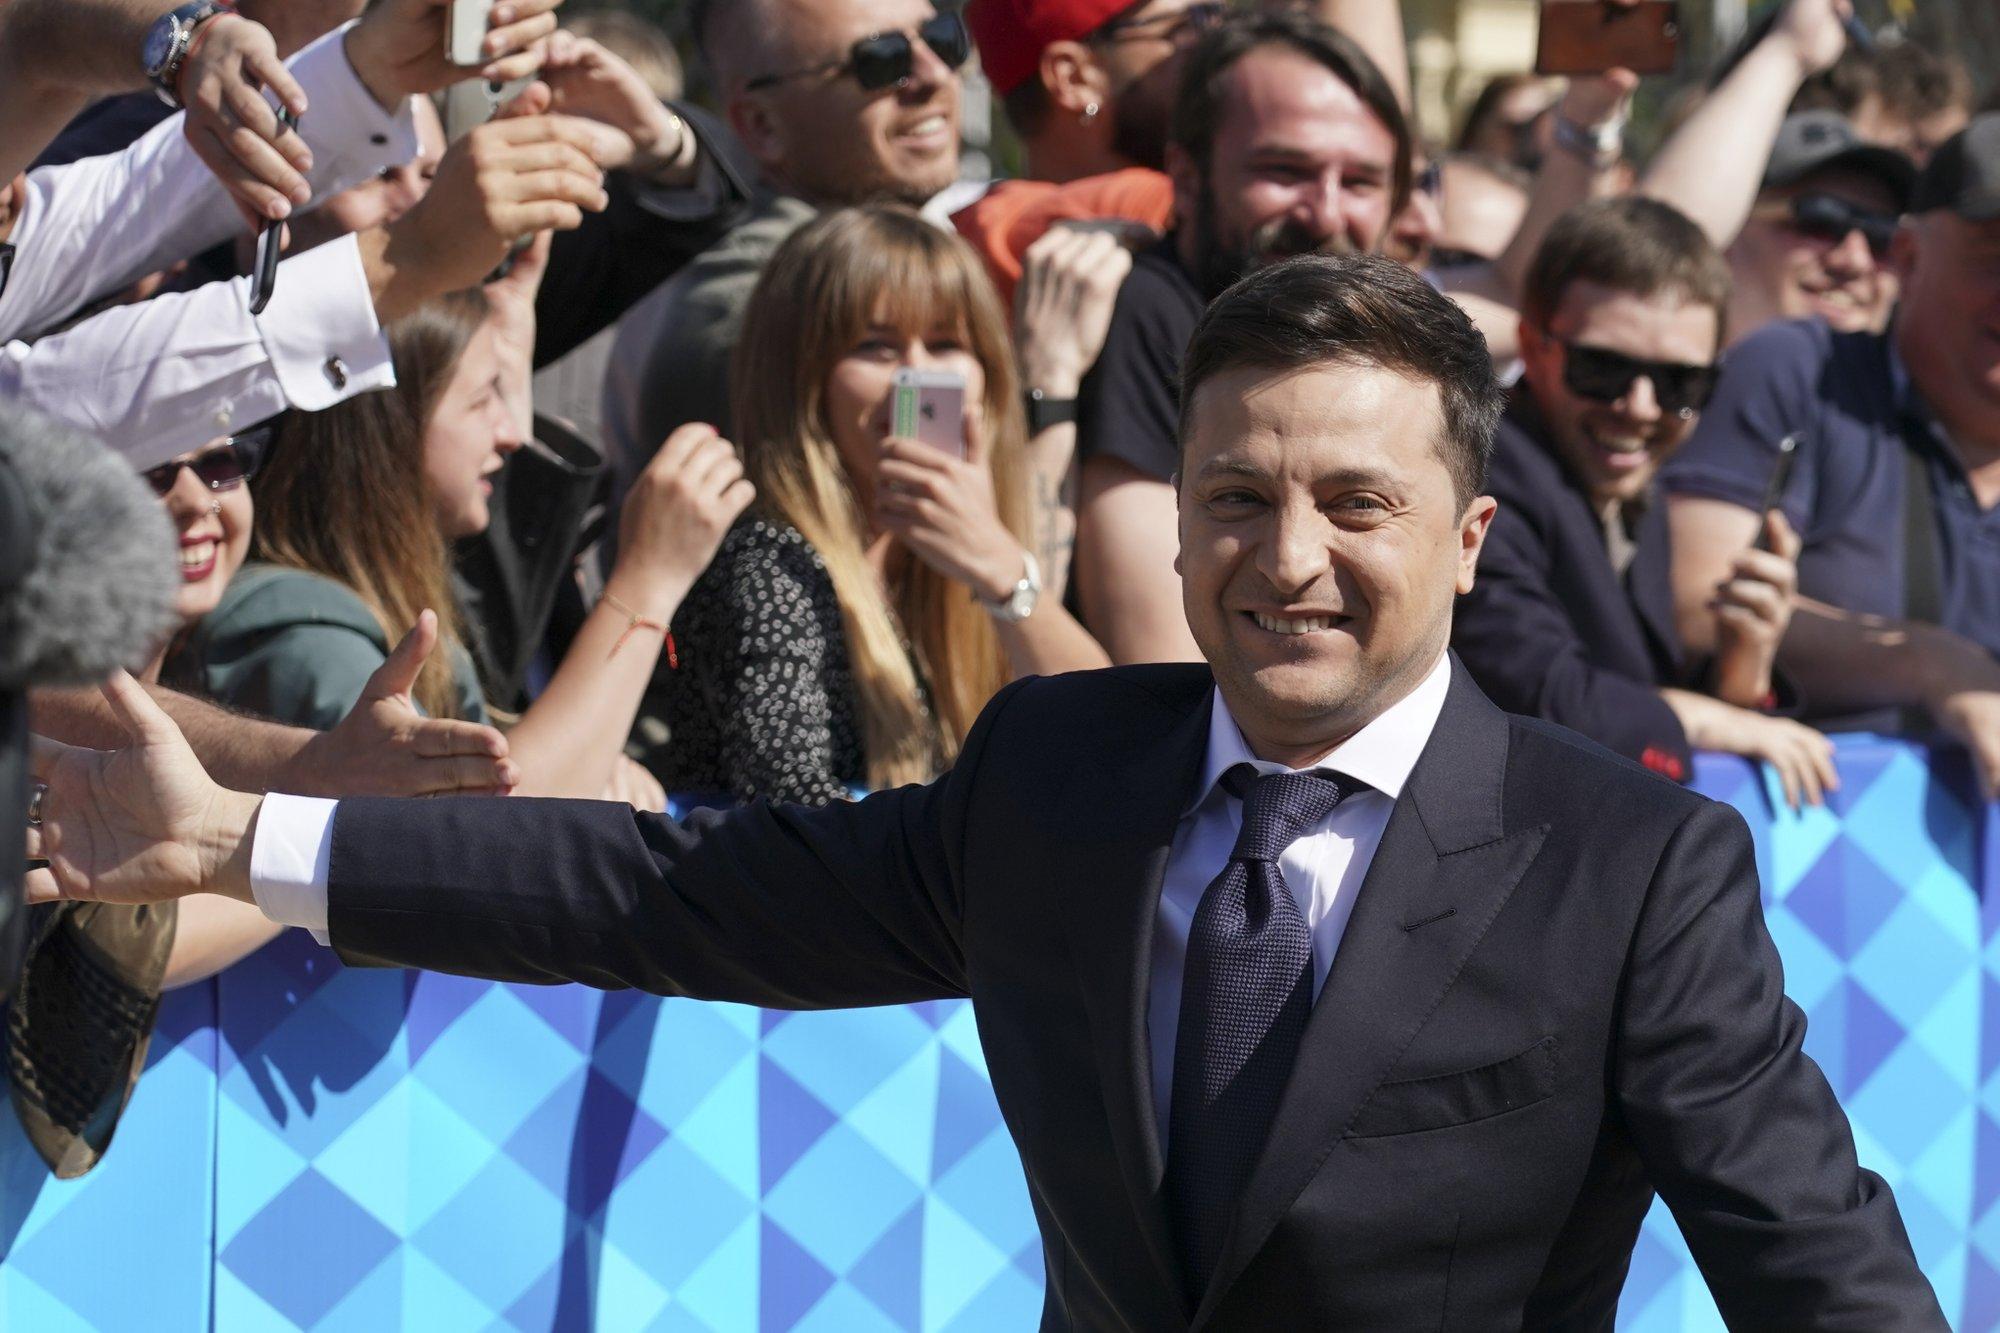 TV comedian Zelenskiy sworn in as Ukraine's president